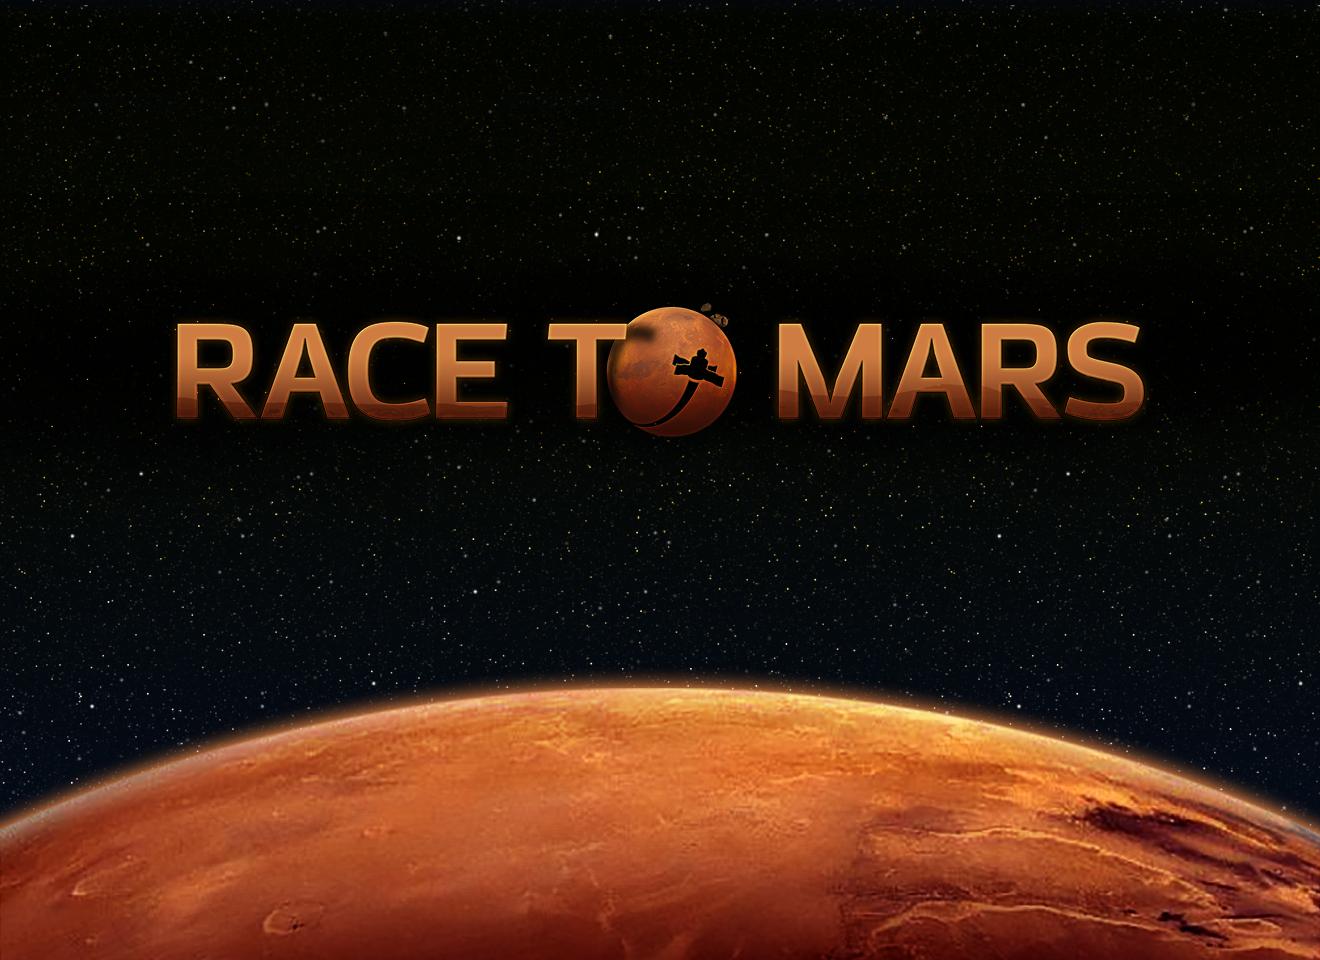 Terra Nova Race to Mars - Pics about space